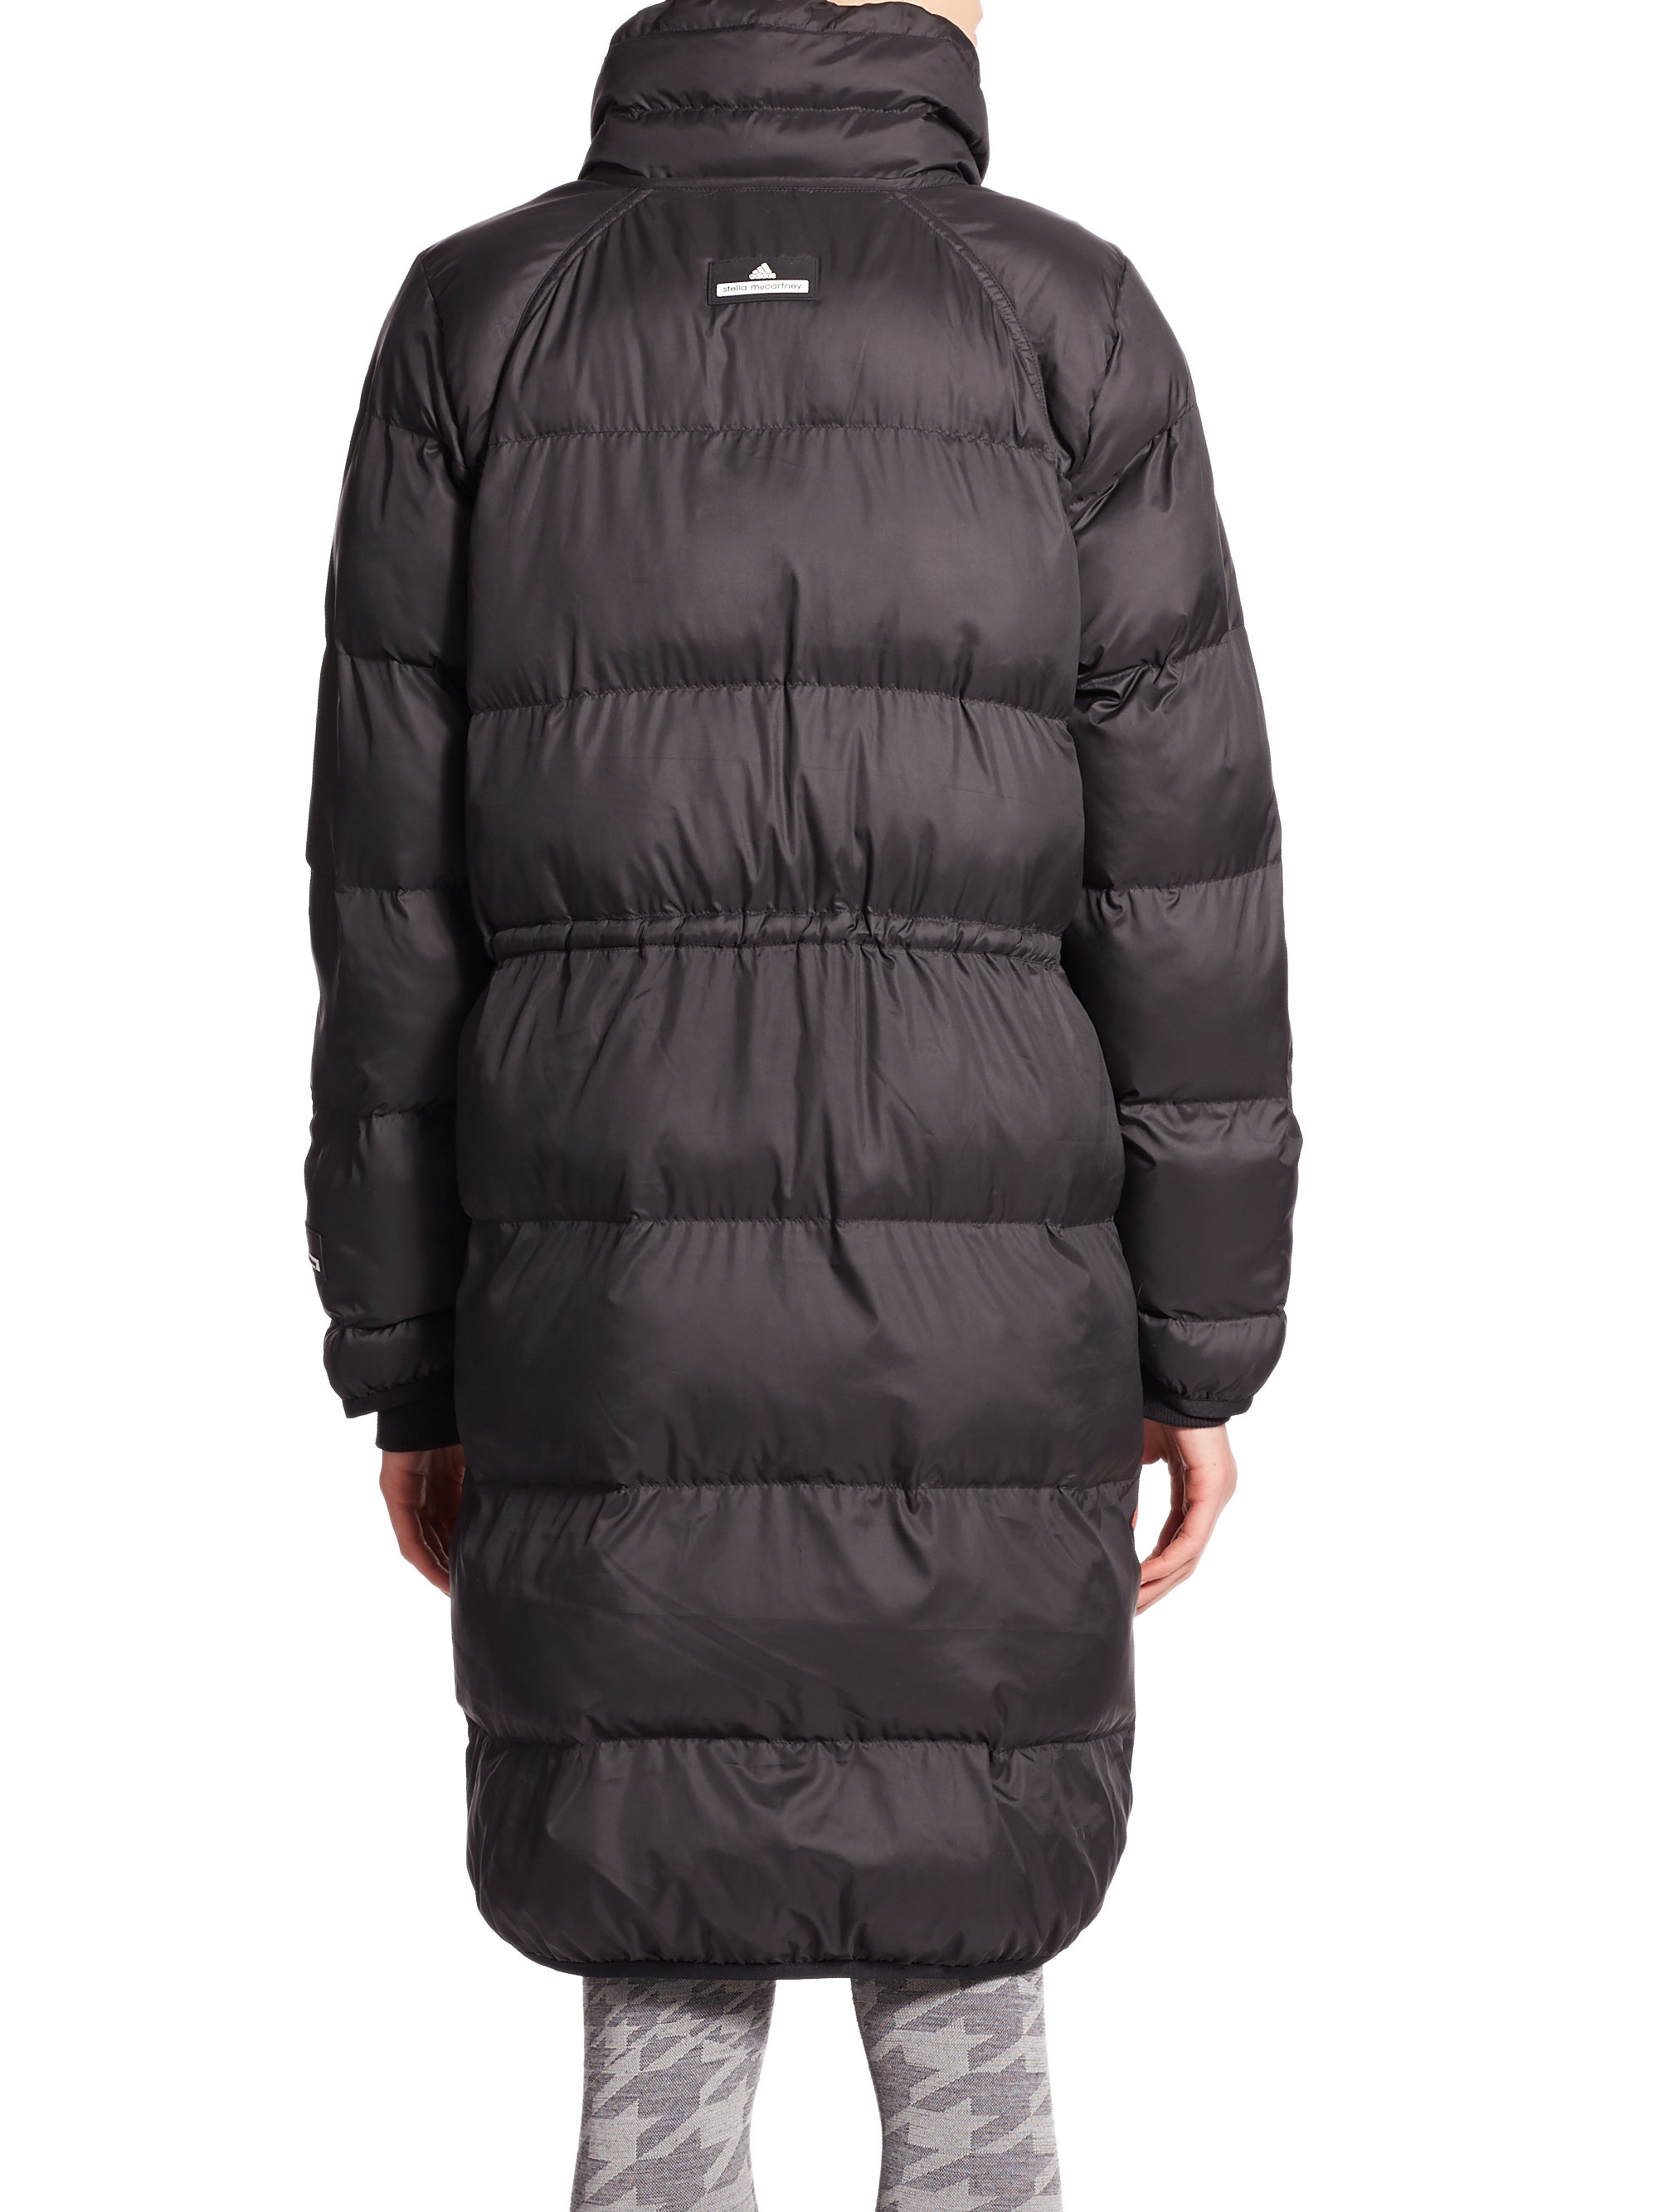 Lyst Adidas By Stella Mccartney By Chaqueta larga Mccartney de Puffer negro en negro 0a606e0 - colja.host